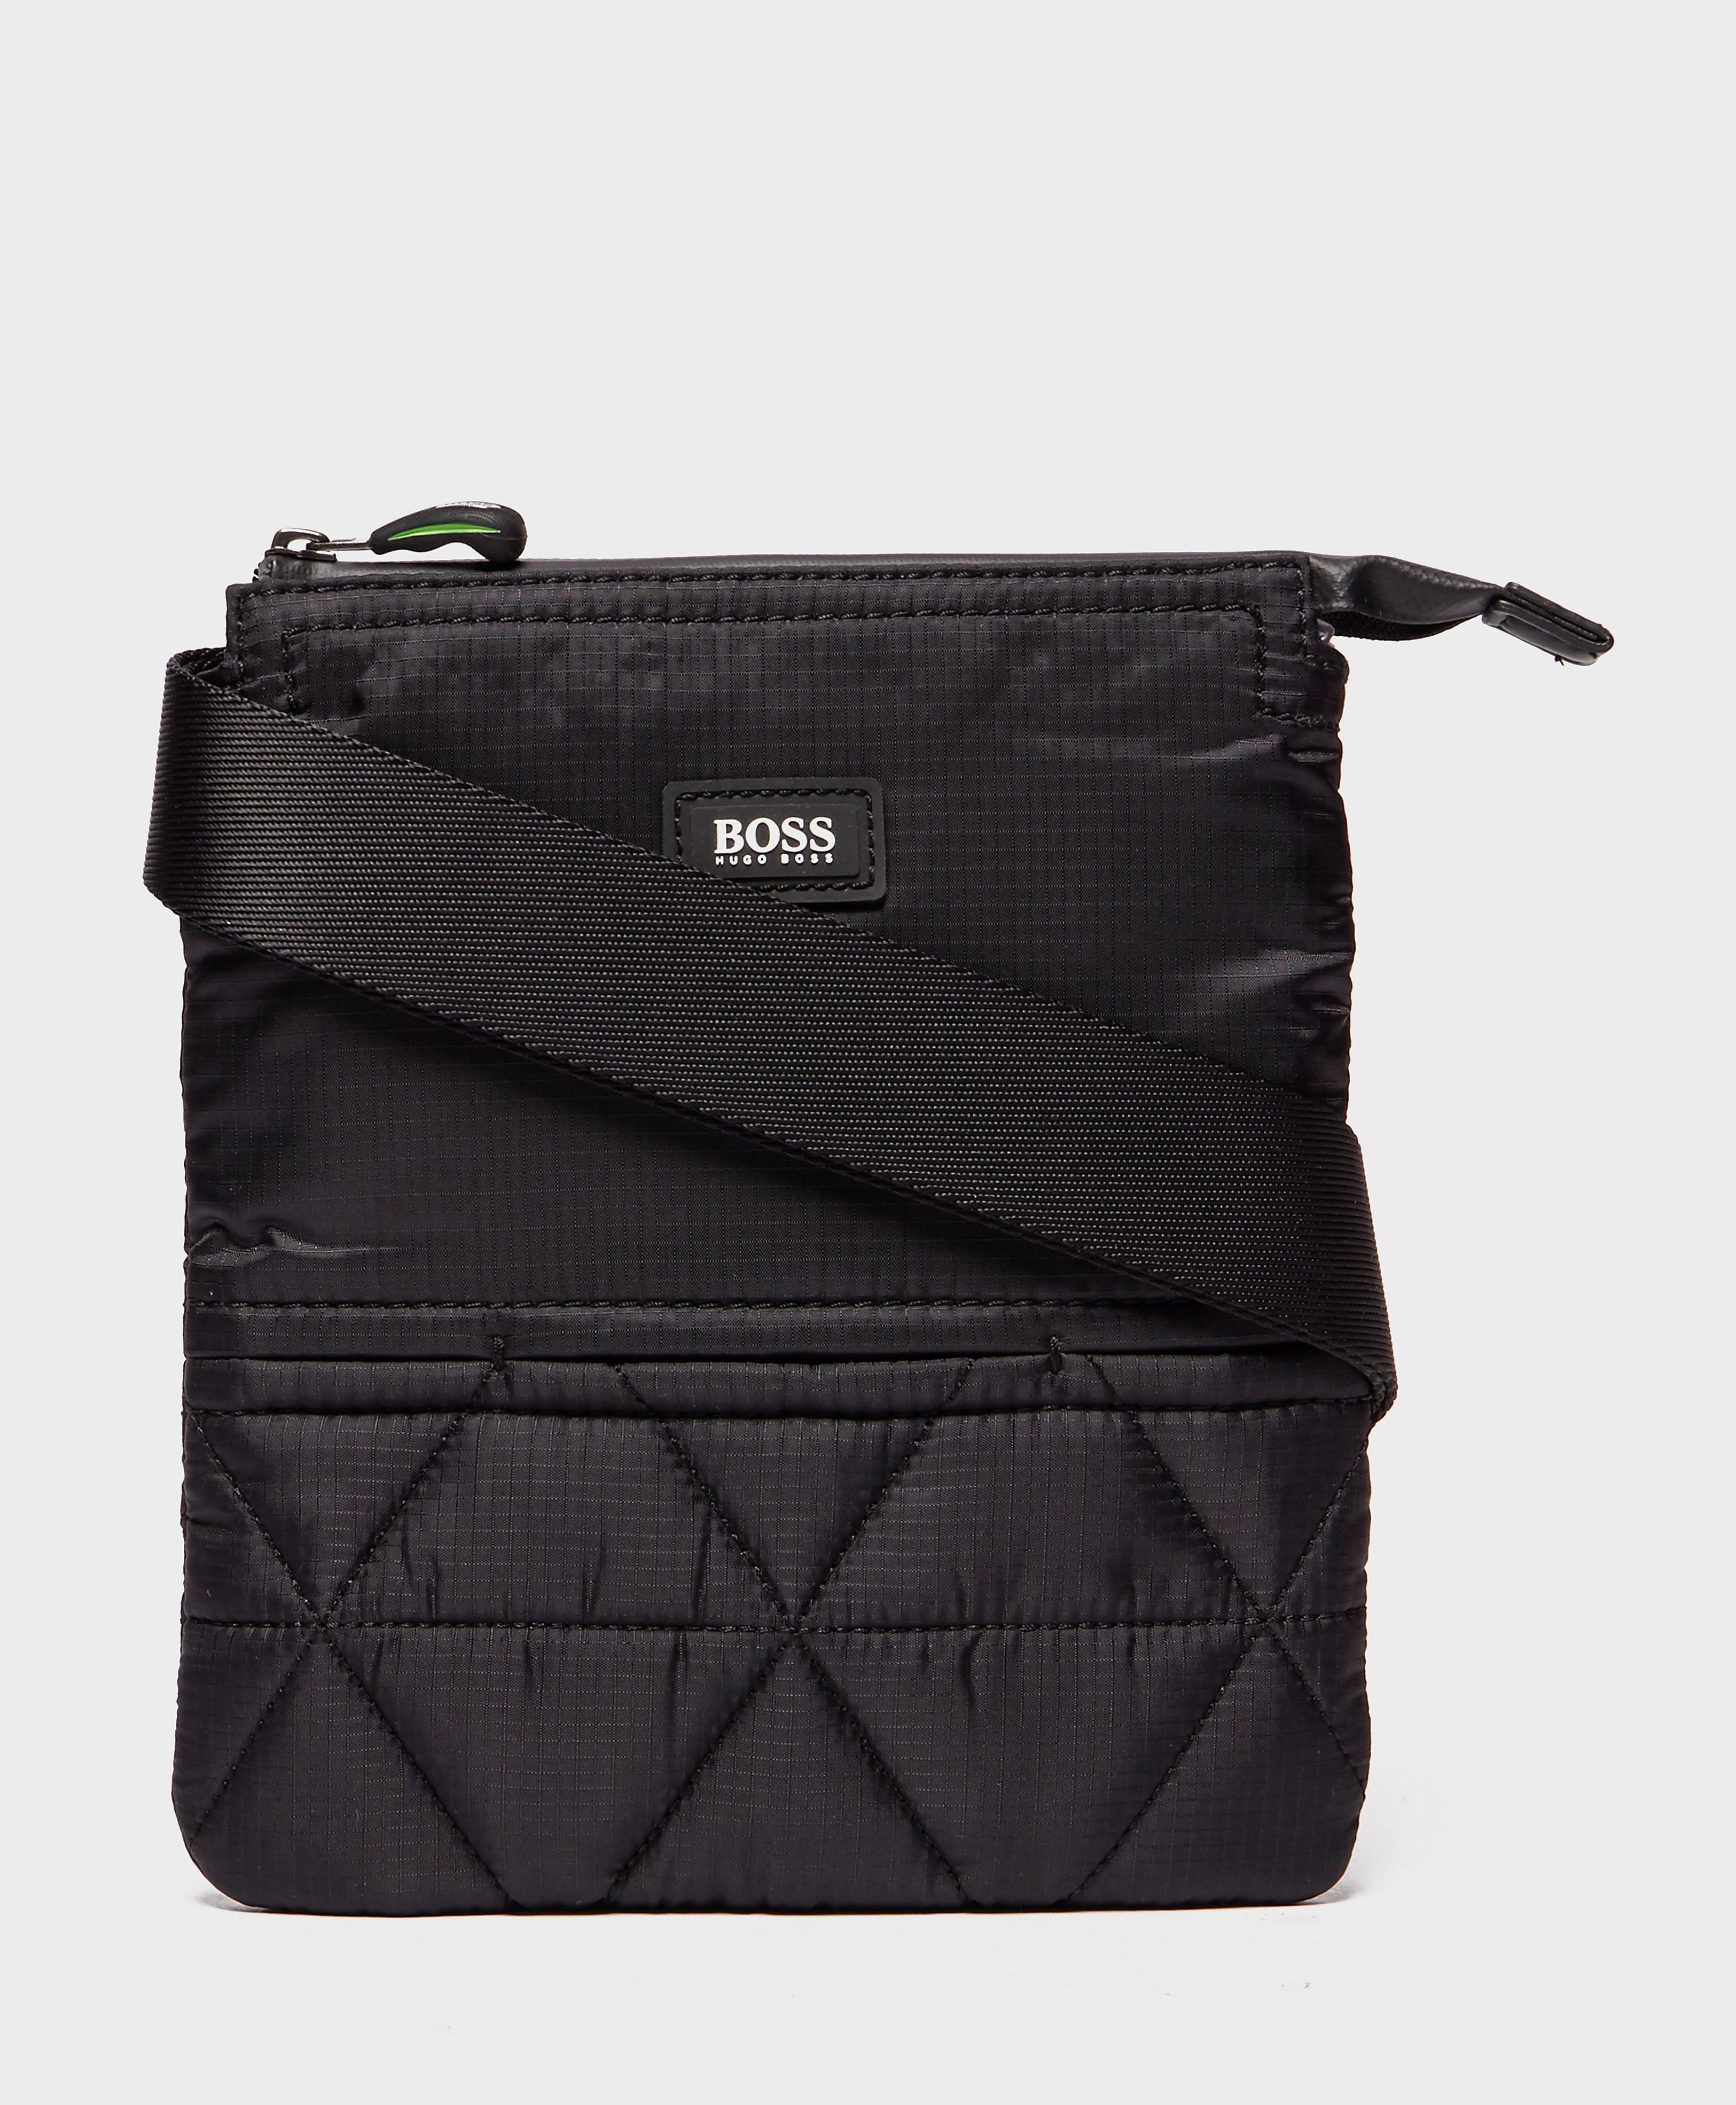 BOSS Green Stash Pouch Bag